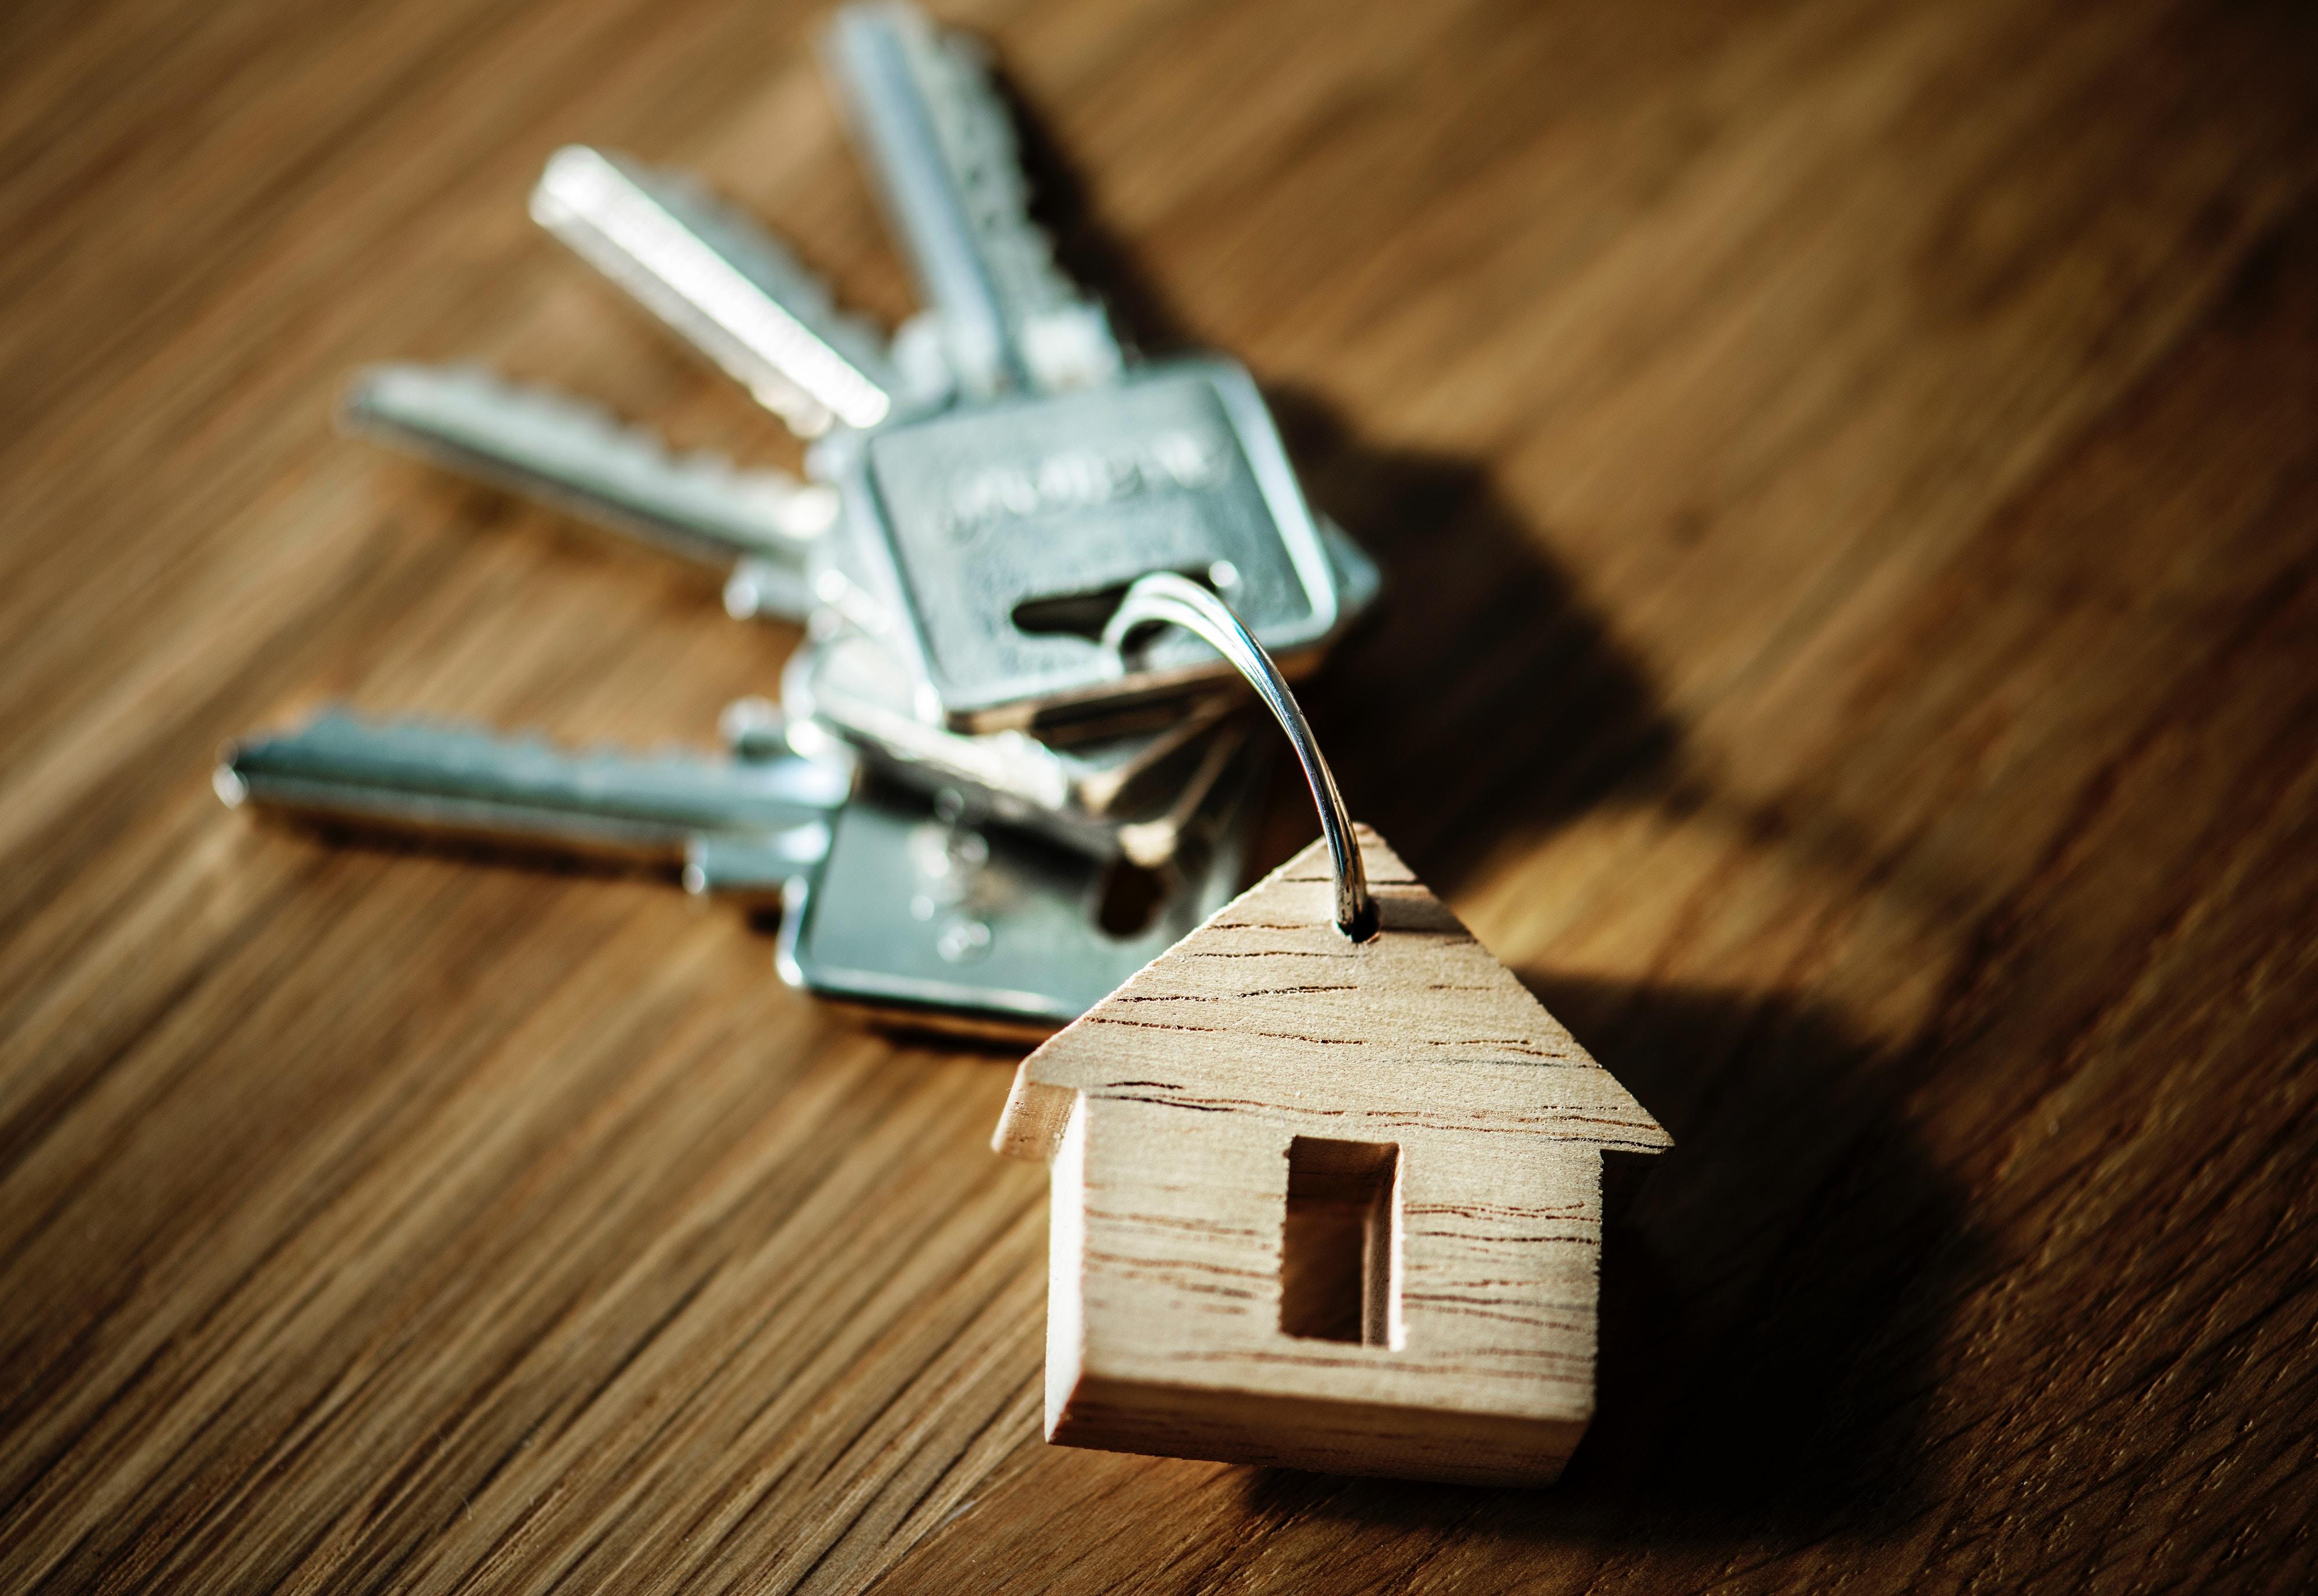 Tiny house on a ring of keys